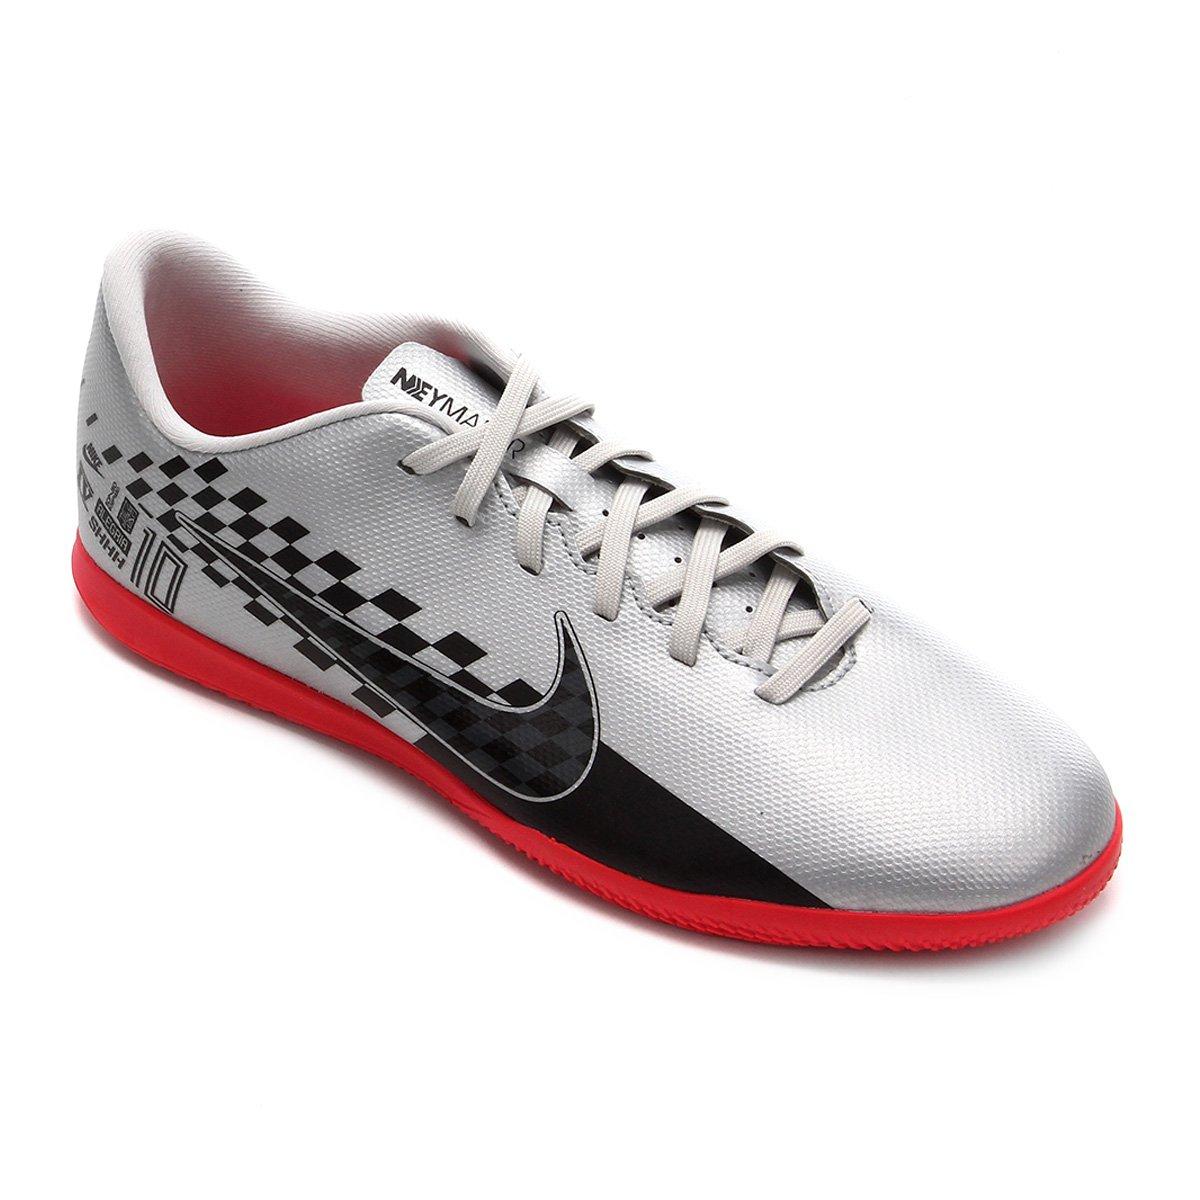 liberar información sobre diseño superior tienda Chuteira Futsal Nike Mercurial Vapor 13 Club Neymar Jr IC - Preto e Vermelho